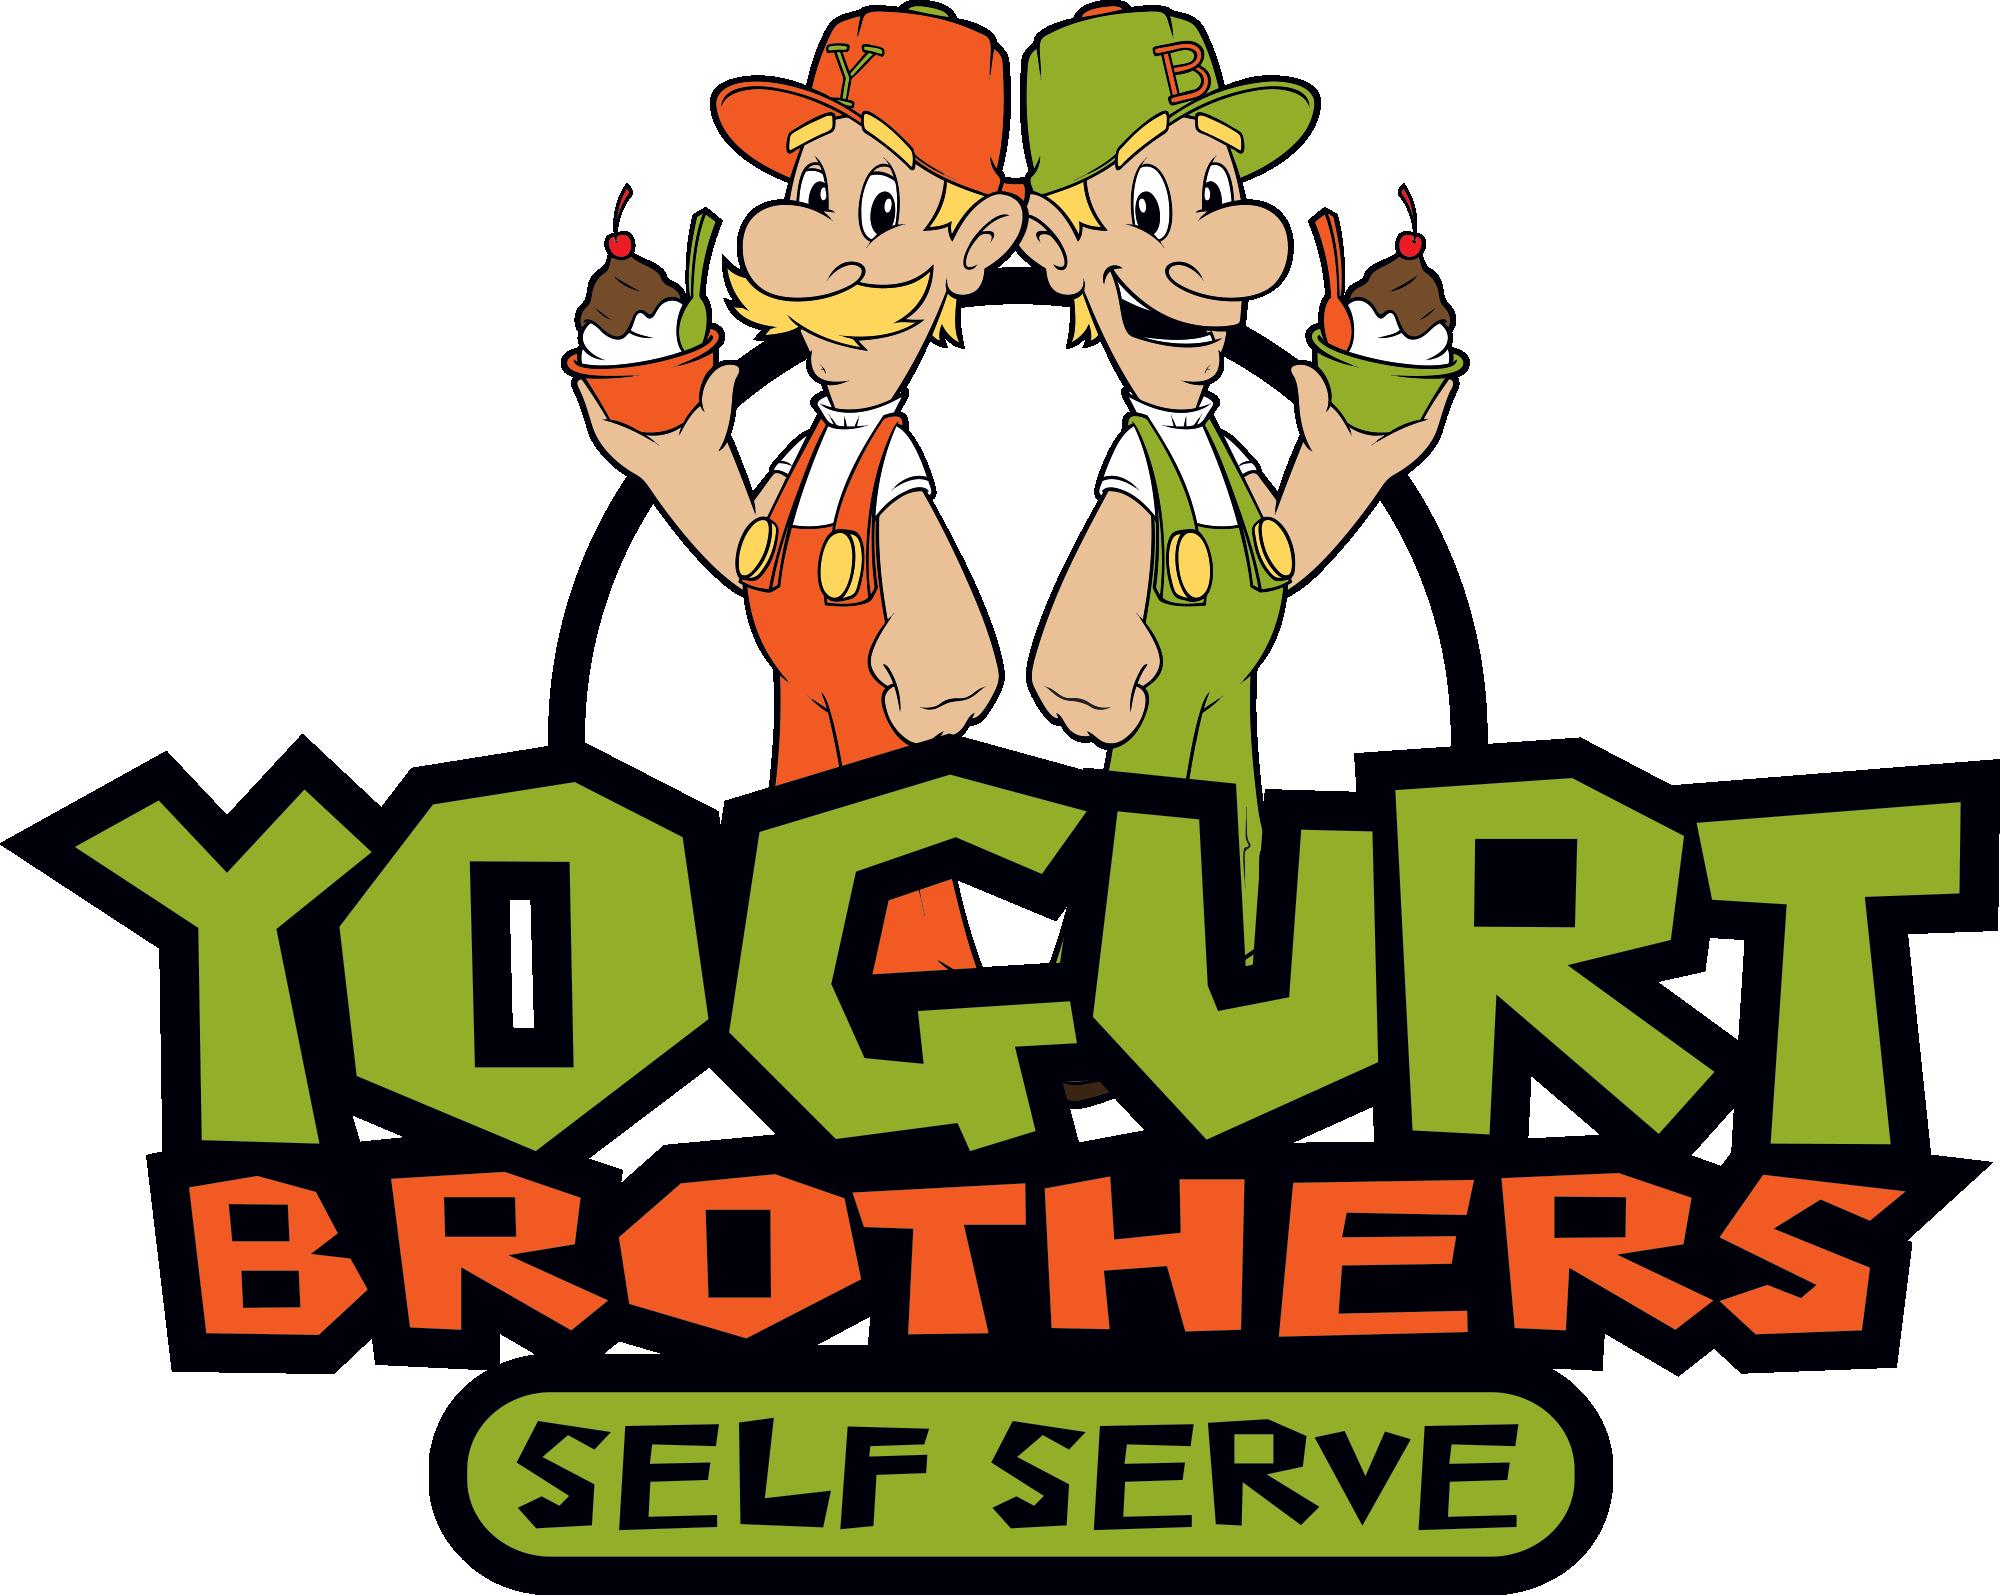 YogurtBrothers_Logo